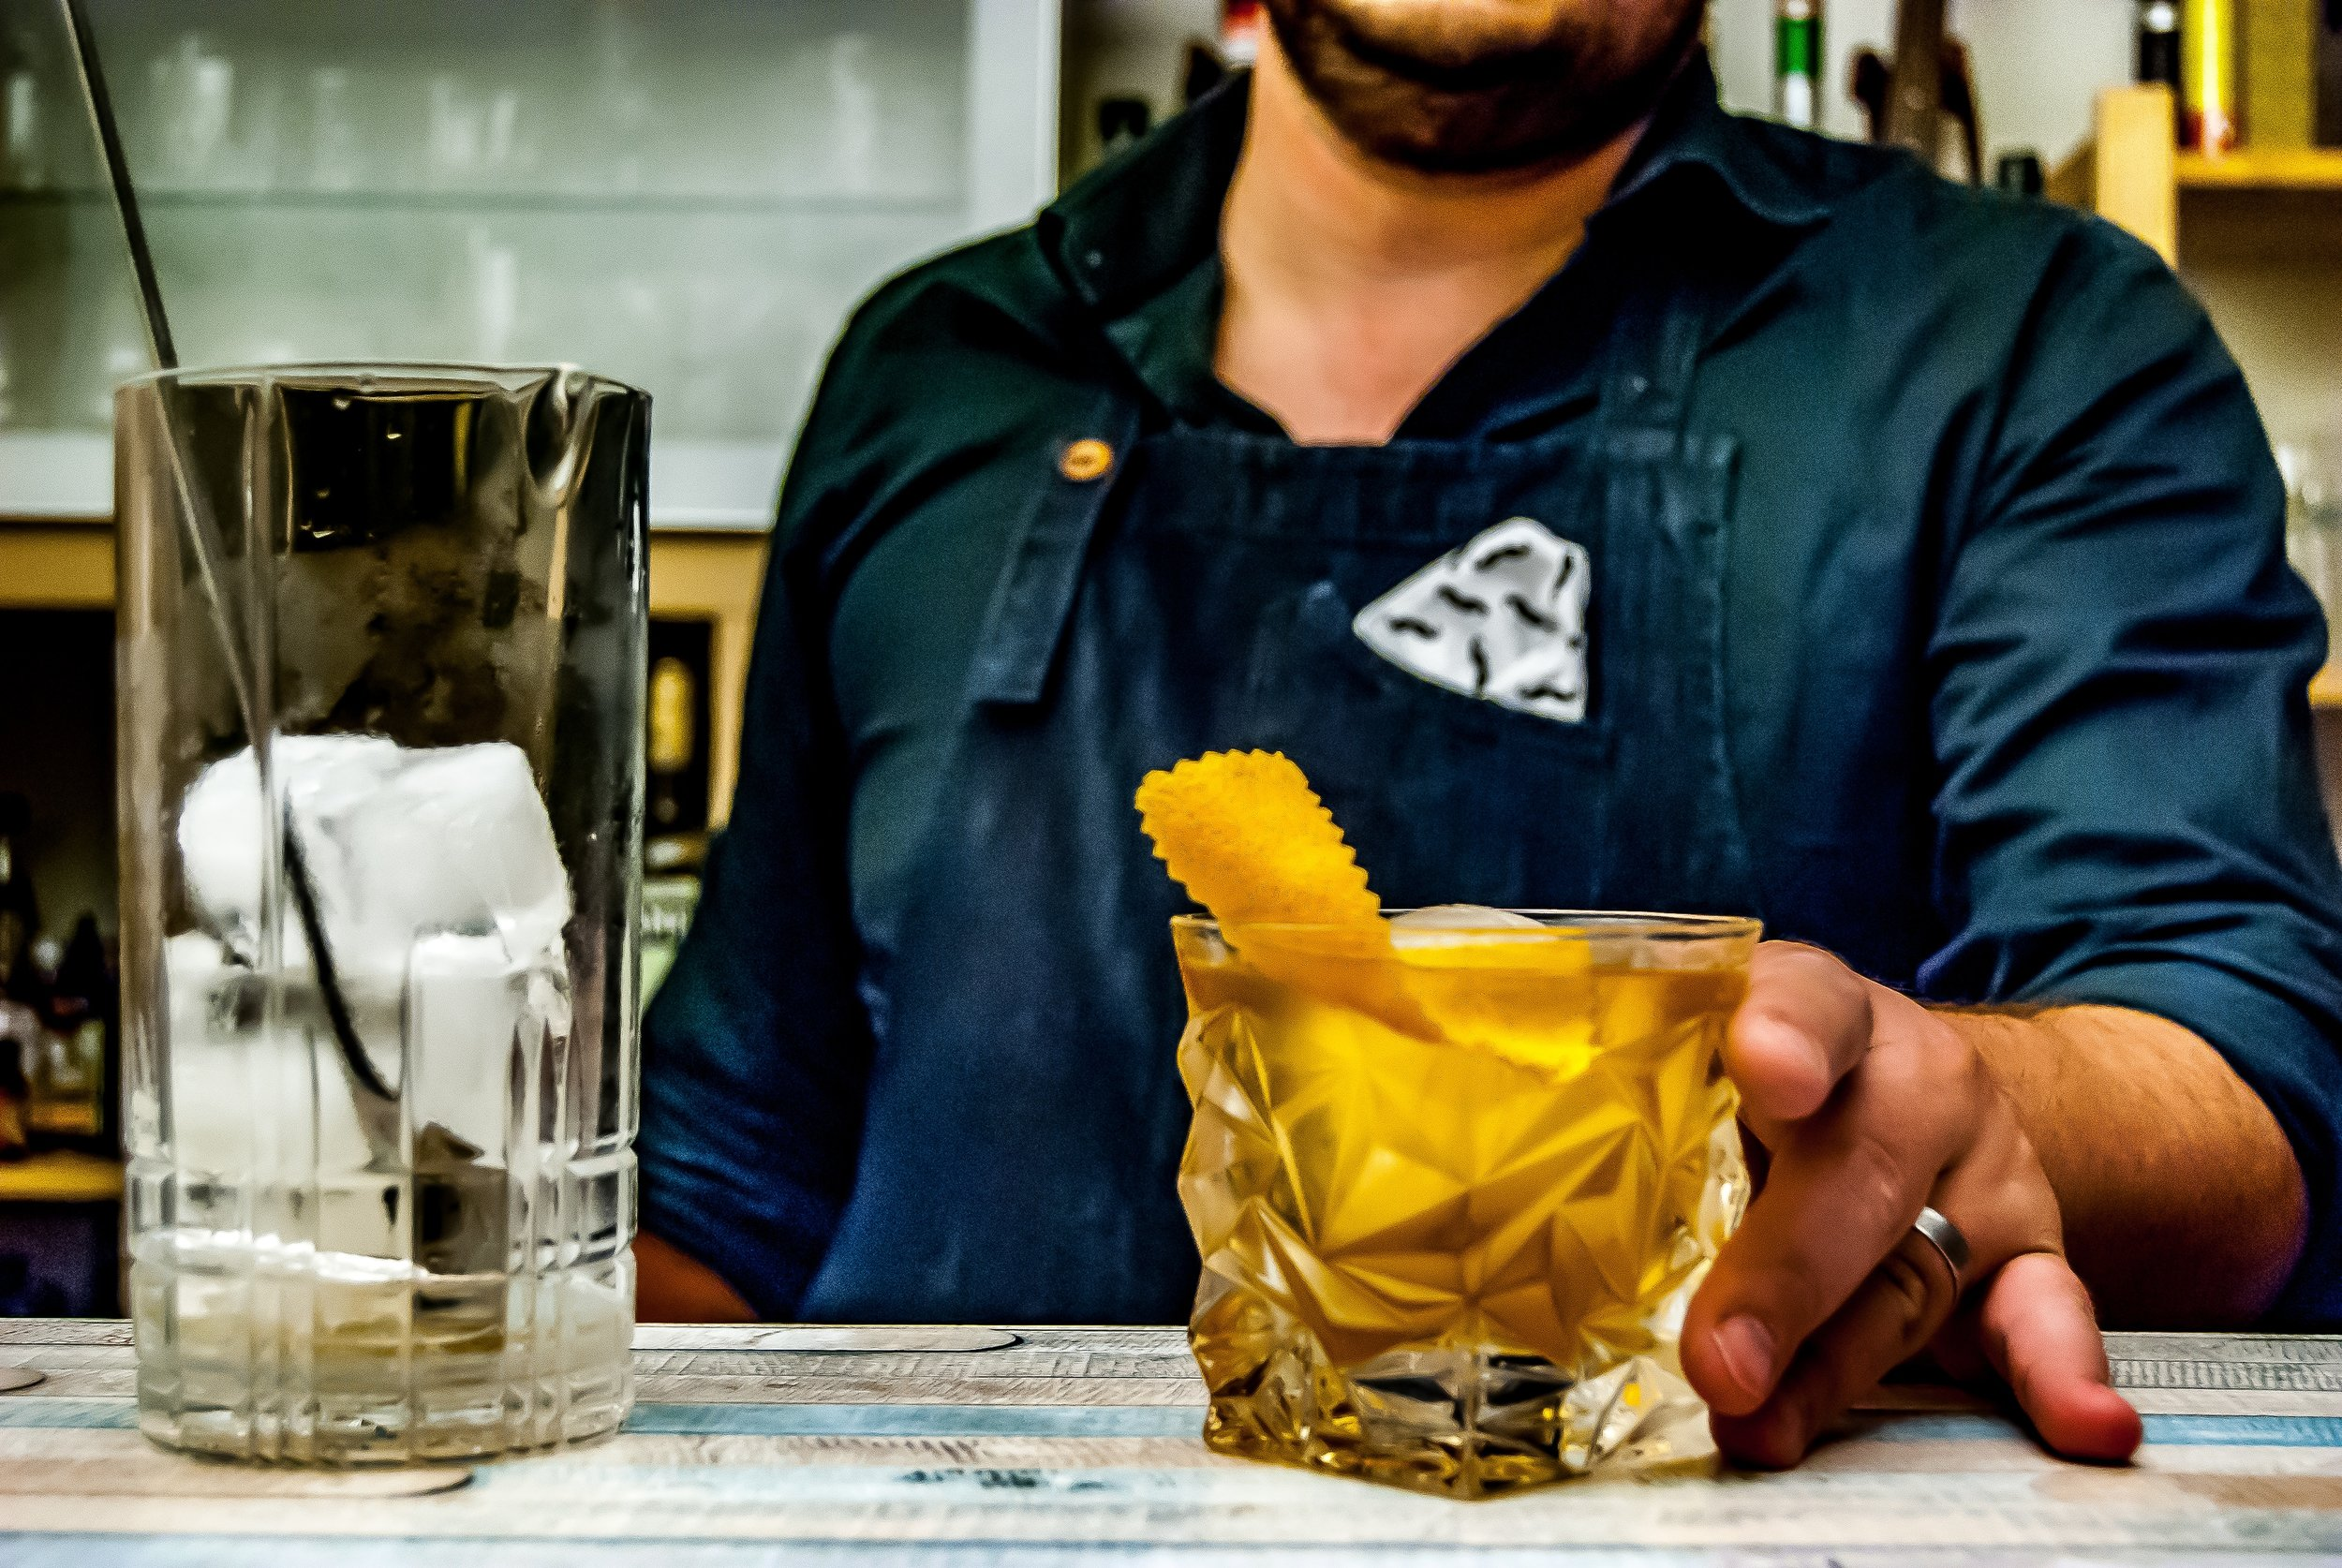 Beverage Services - BARTENDING, BEVERAGE SUPPLY & ESPRESSO